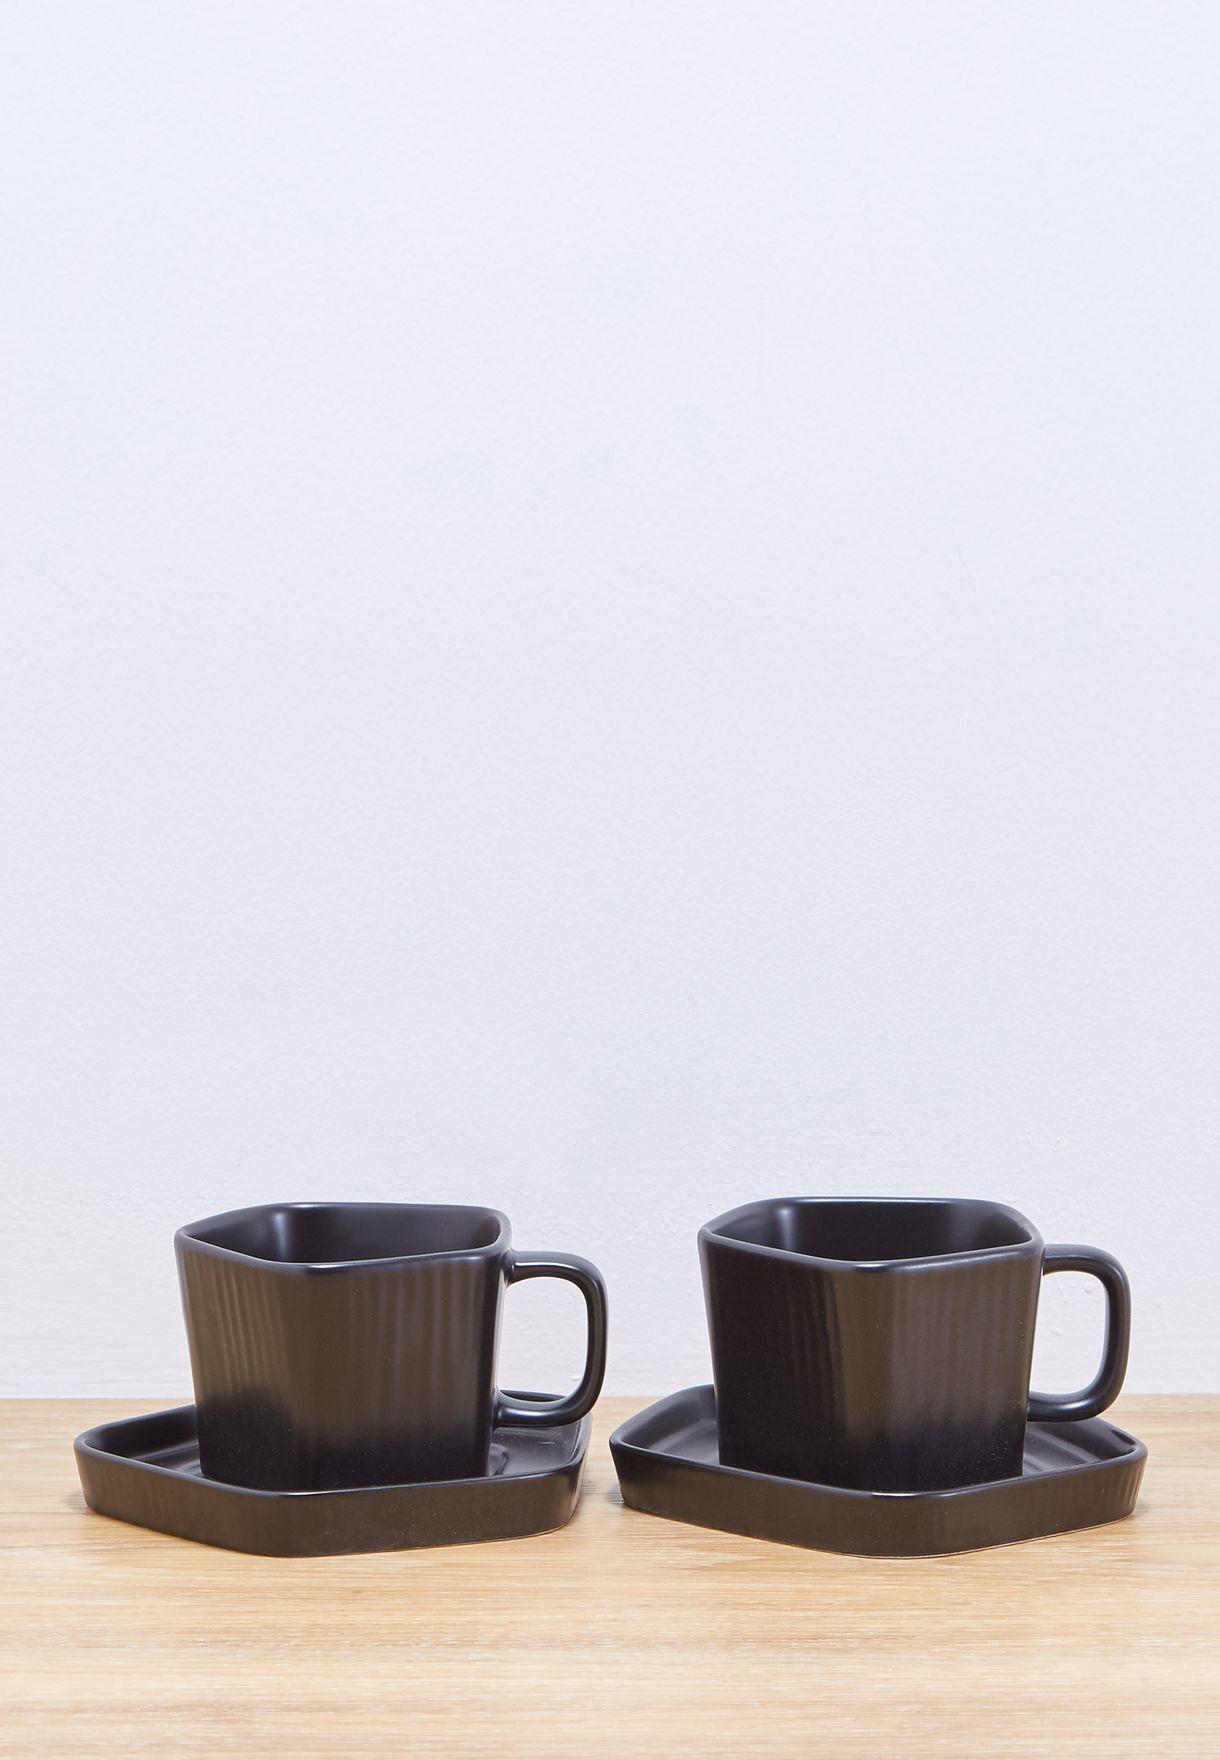 كوبان وطبقان للشاي